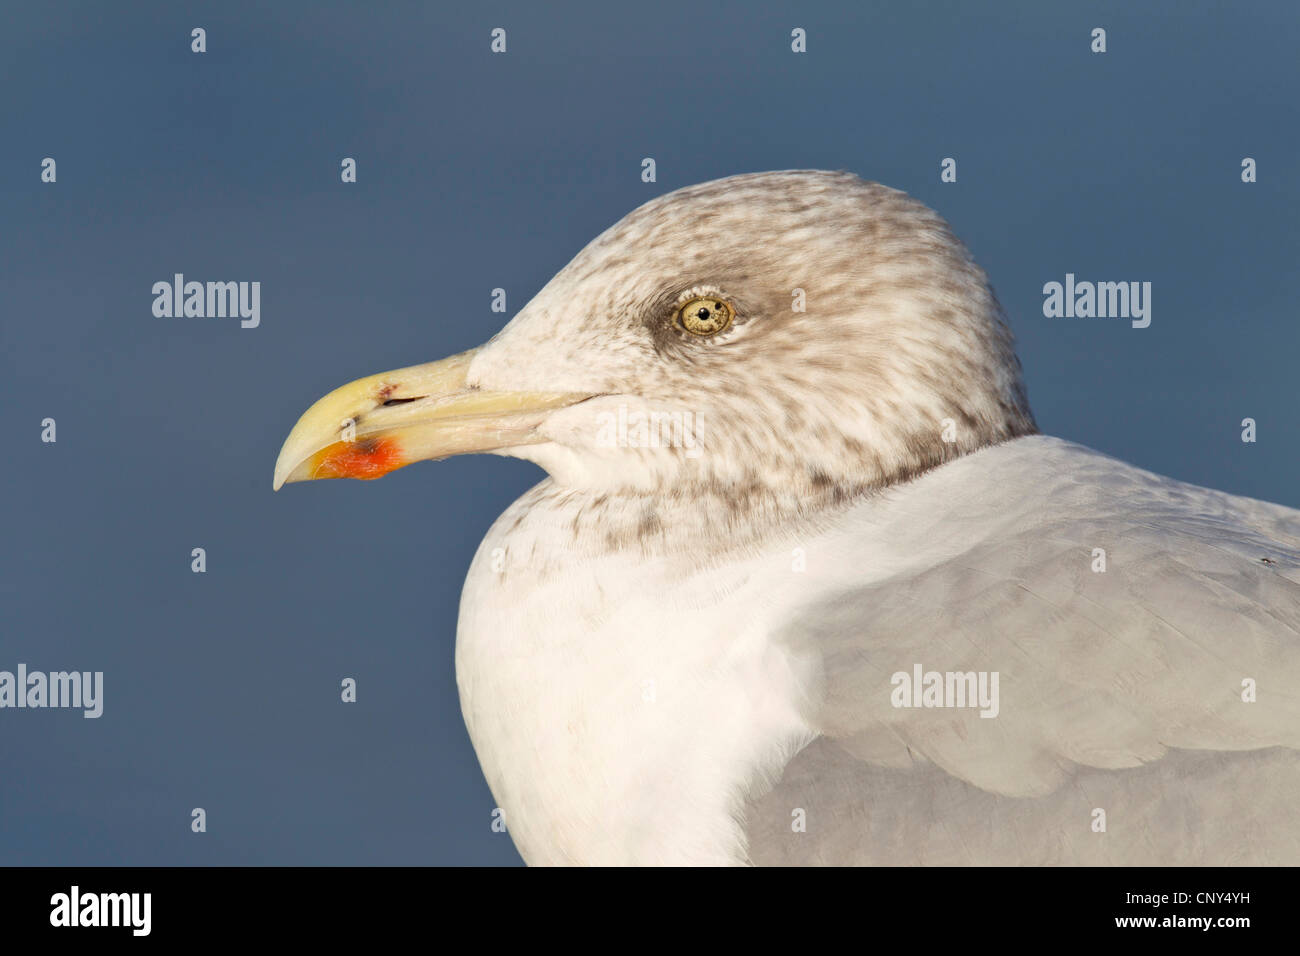 herring gull (Larus argentatus), juvenile in third winter dress, portrait, Germany, Schleswig-Holstein - Stock Image